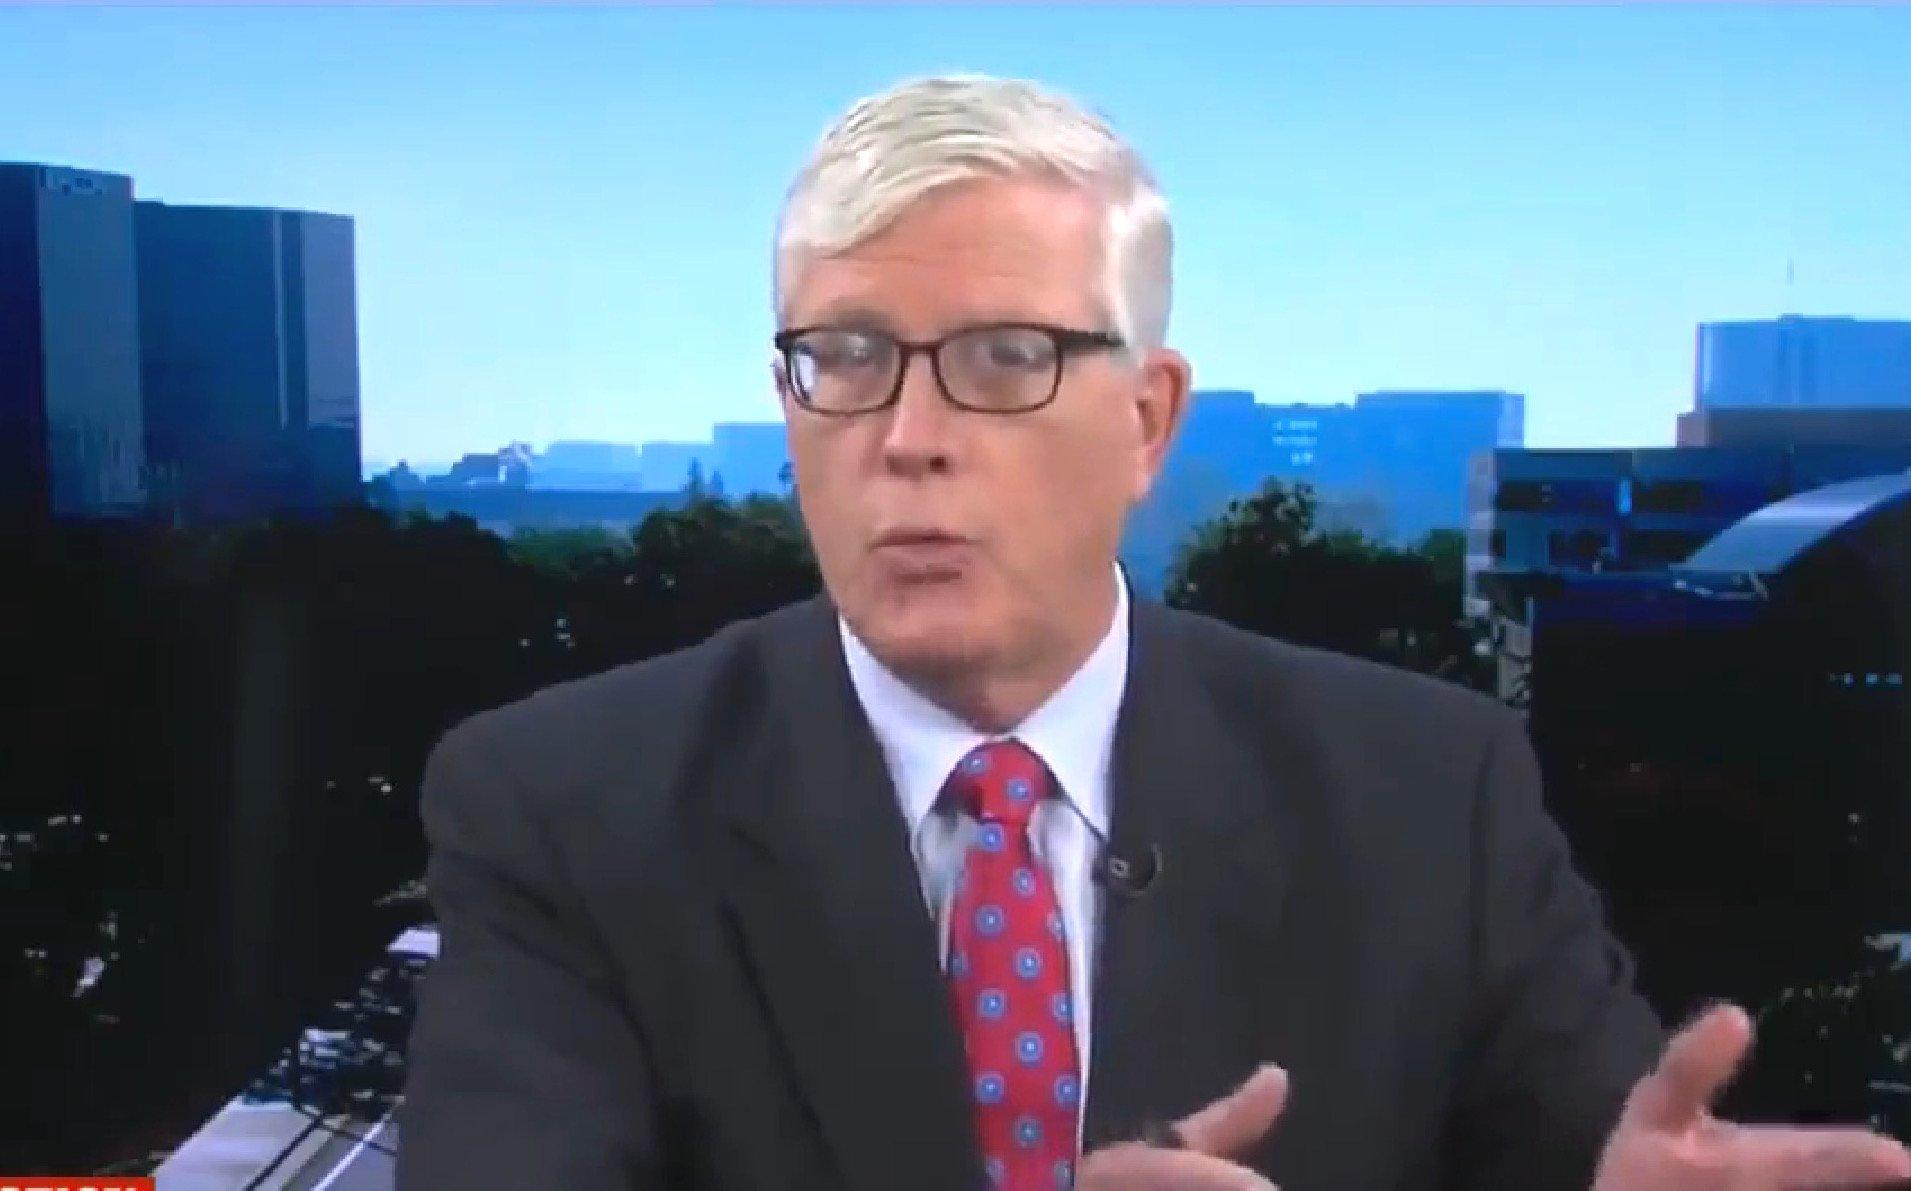 Conservative Commentator Hugh Hewitt Proposes 'No More Trench Coats' After Santa Fe Shooting https://t.co/onaxZtg2eN https://t.co/3wzkYFGBB8